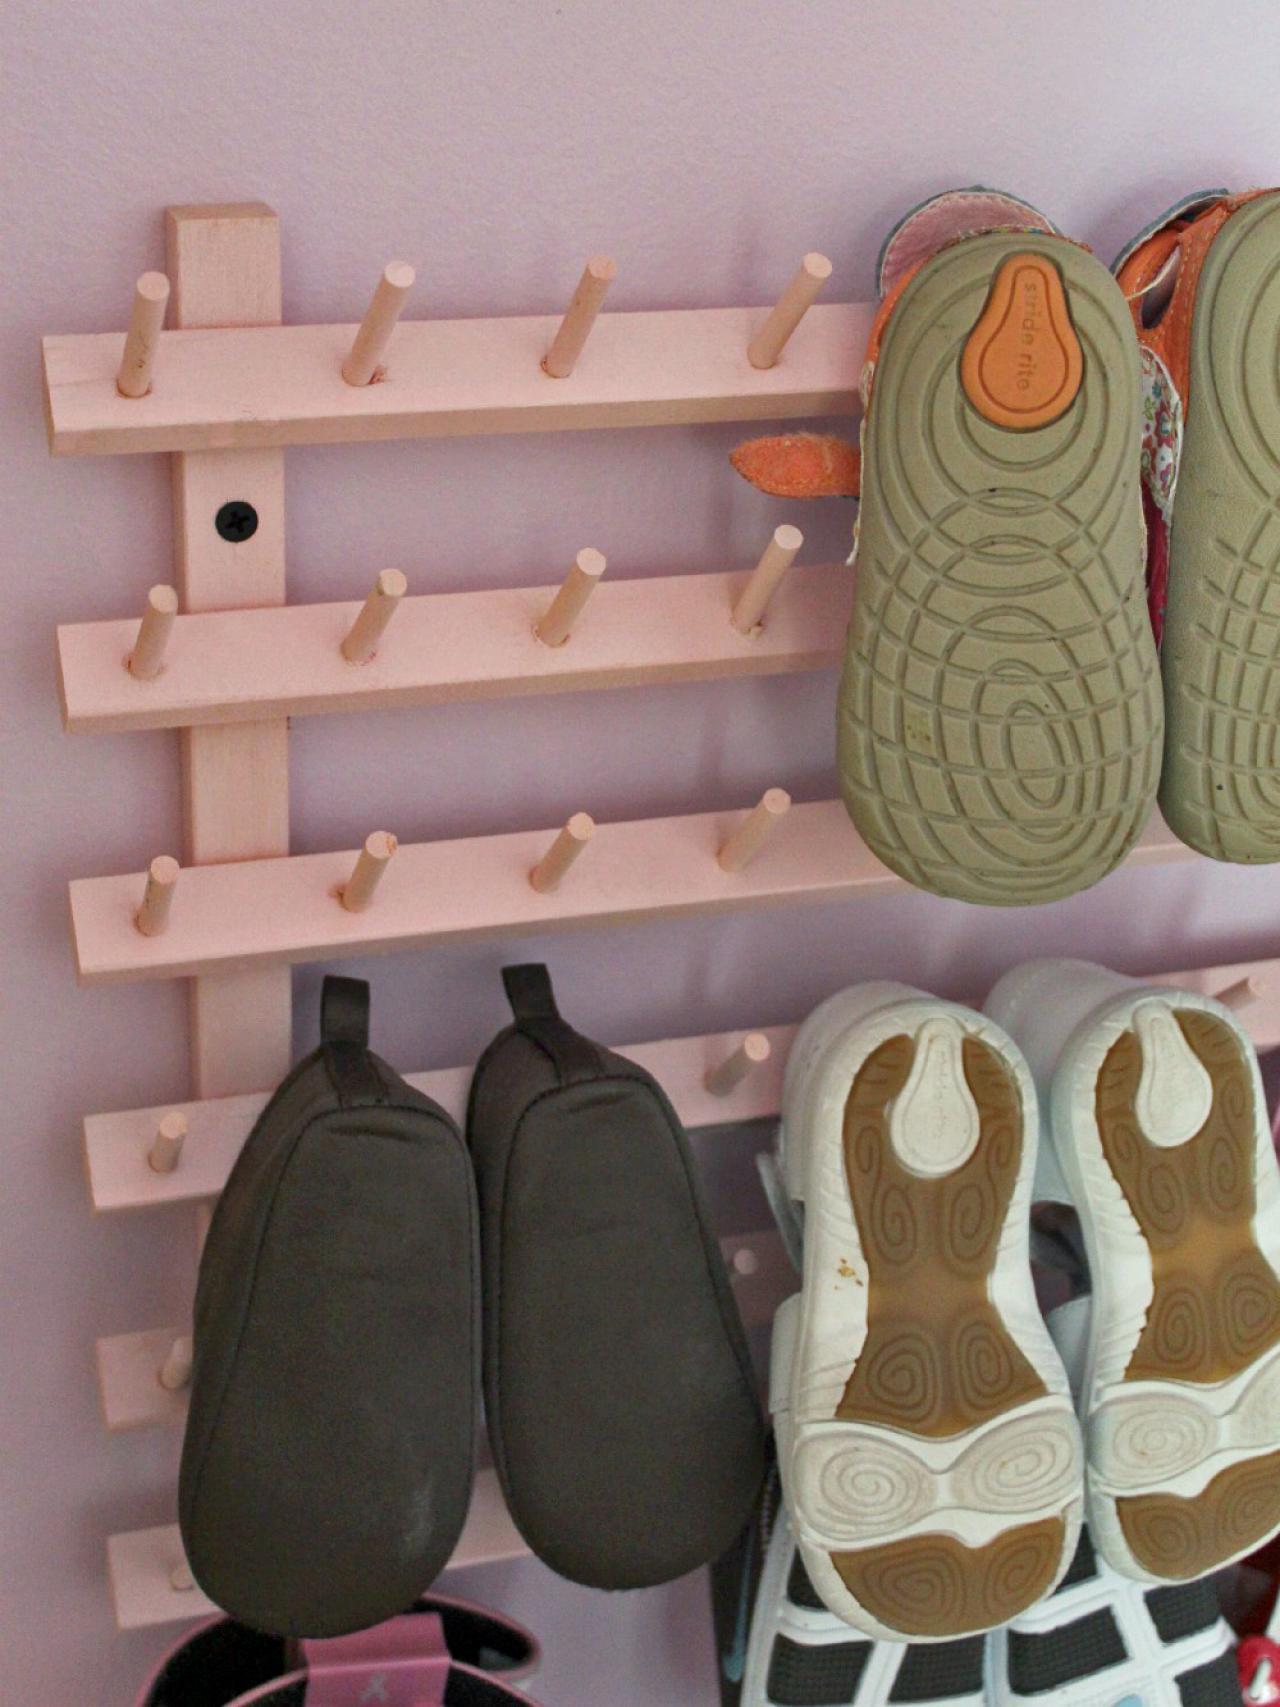 Wooden Shoe Hanging Hooks